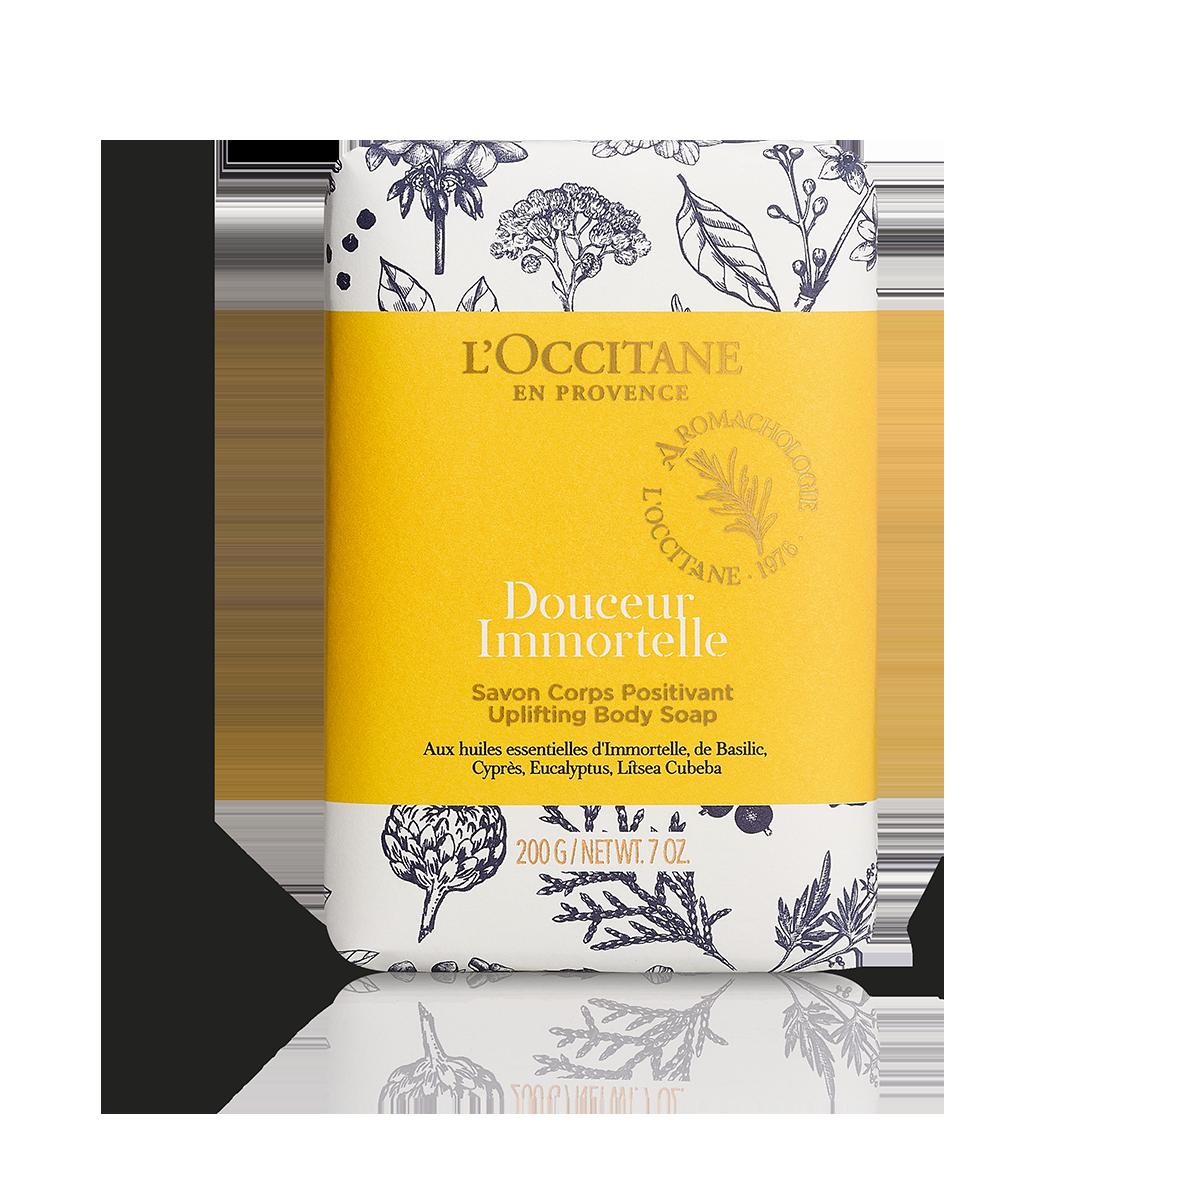 Douceur Immortelle Uplifting Body Soap